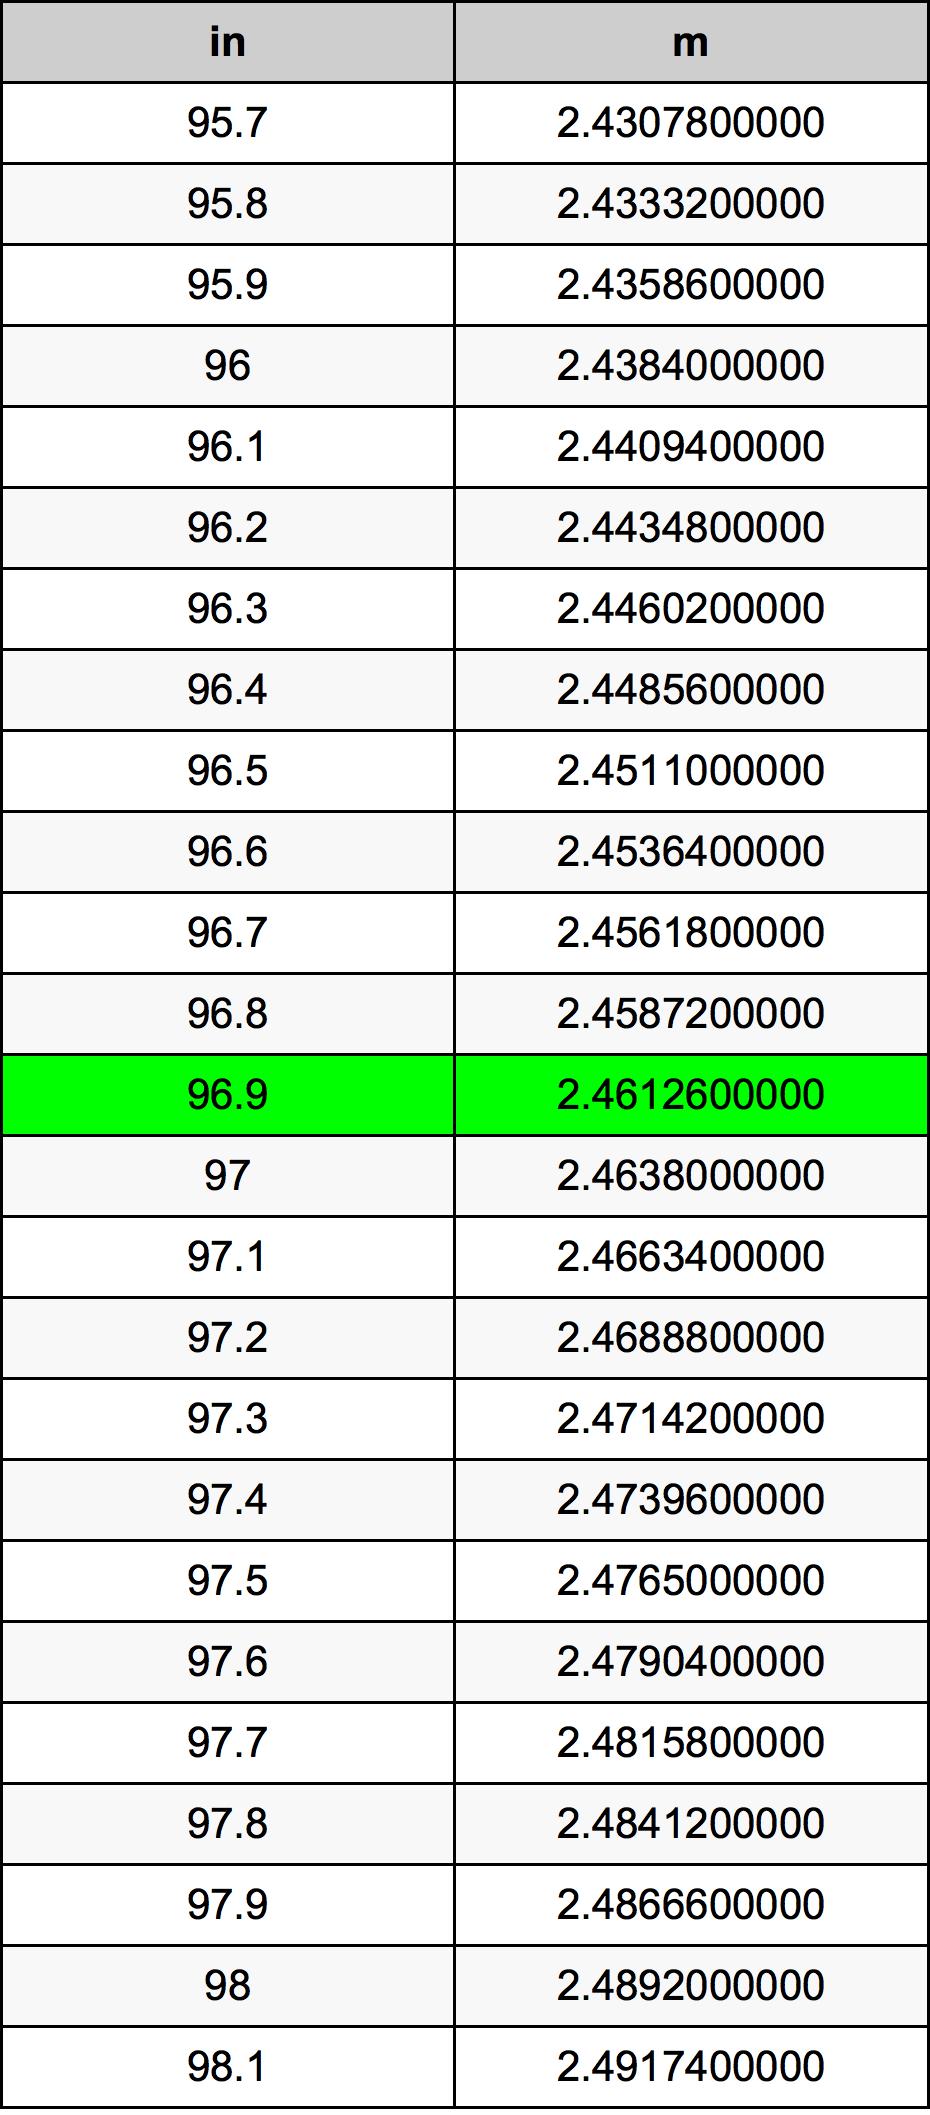 96.9 Inch konverteringstabell